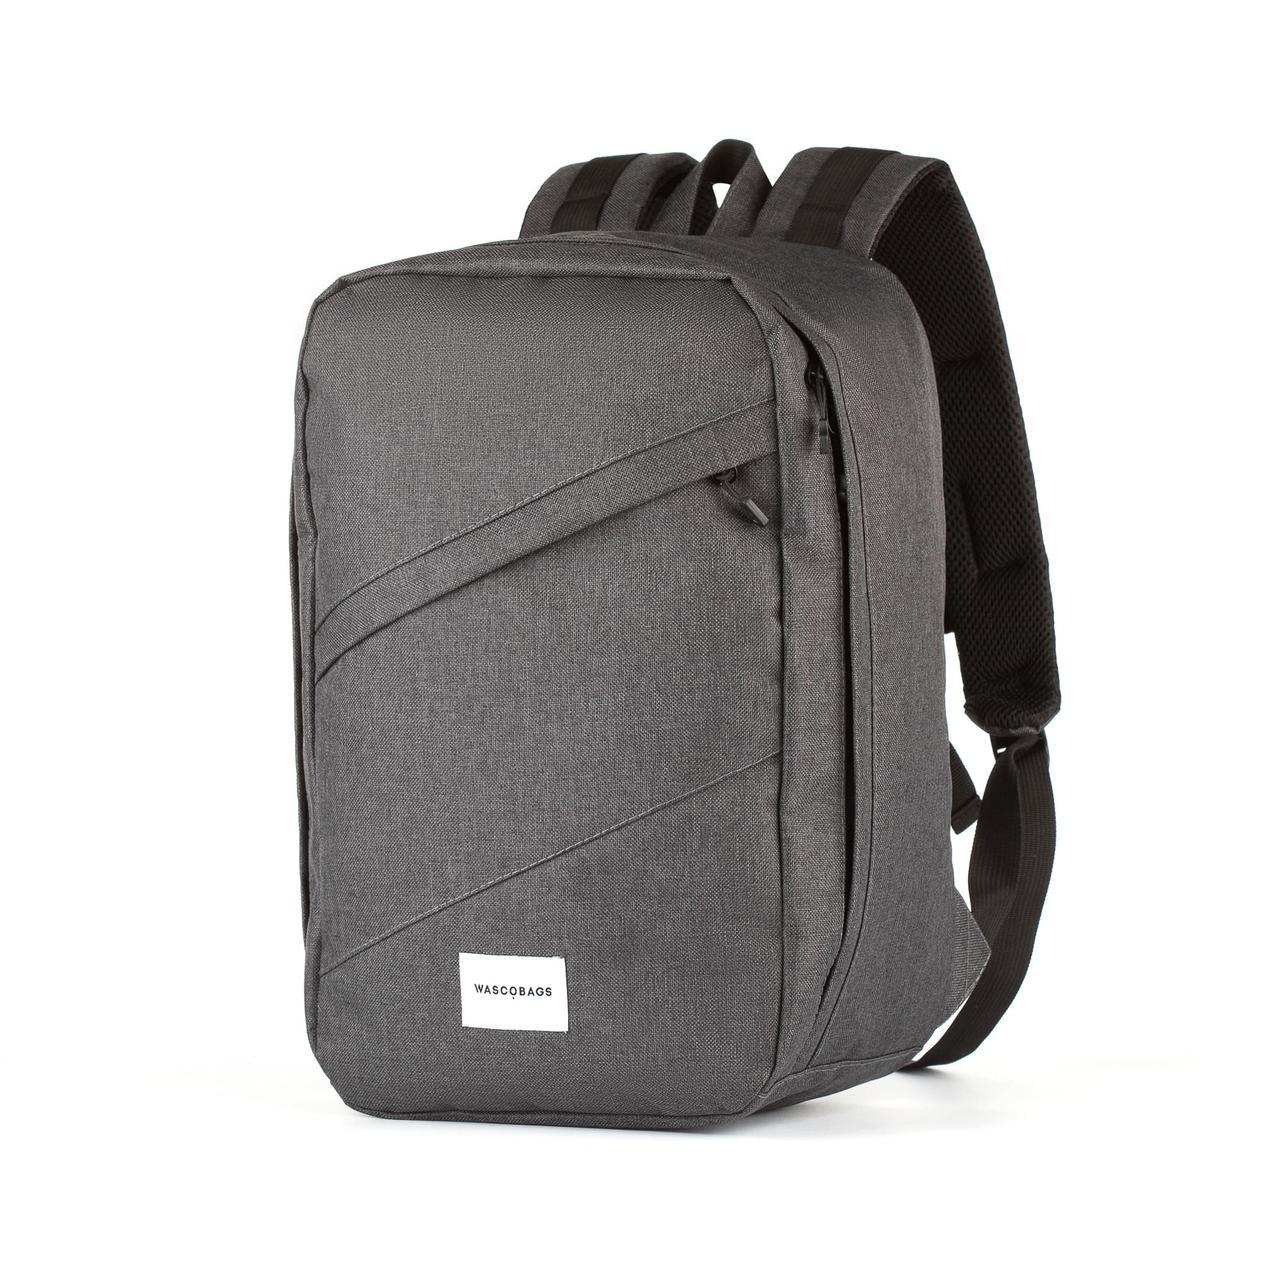 Рюкзак для ручной клади Wascobags 40x20x25 RW Меланж Темный